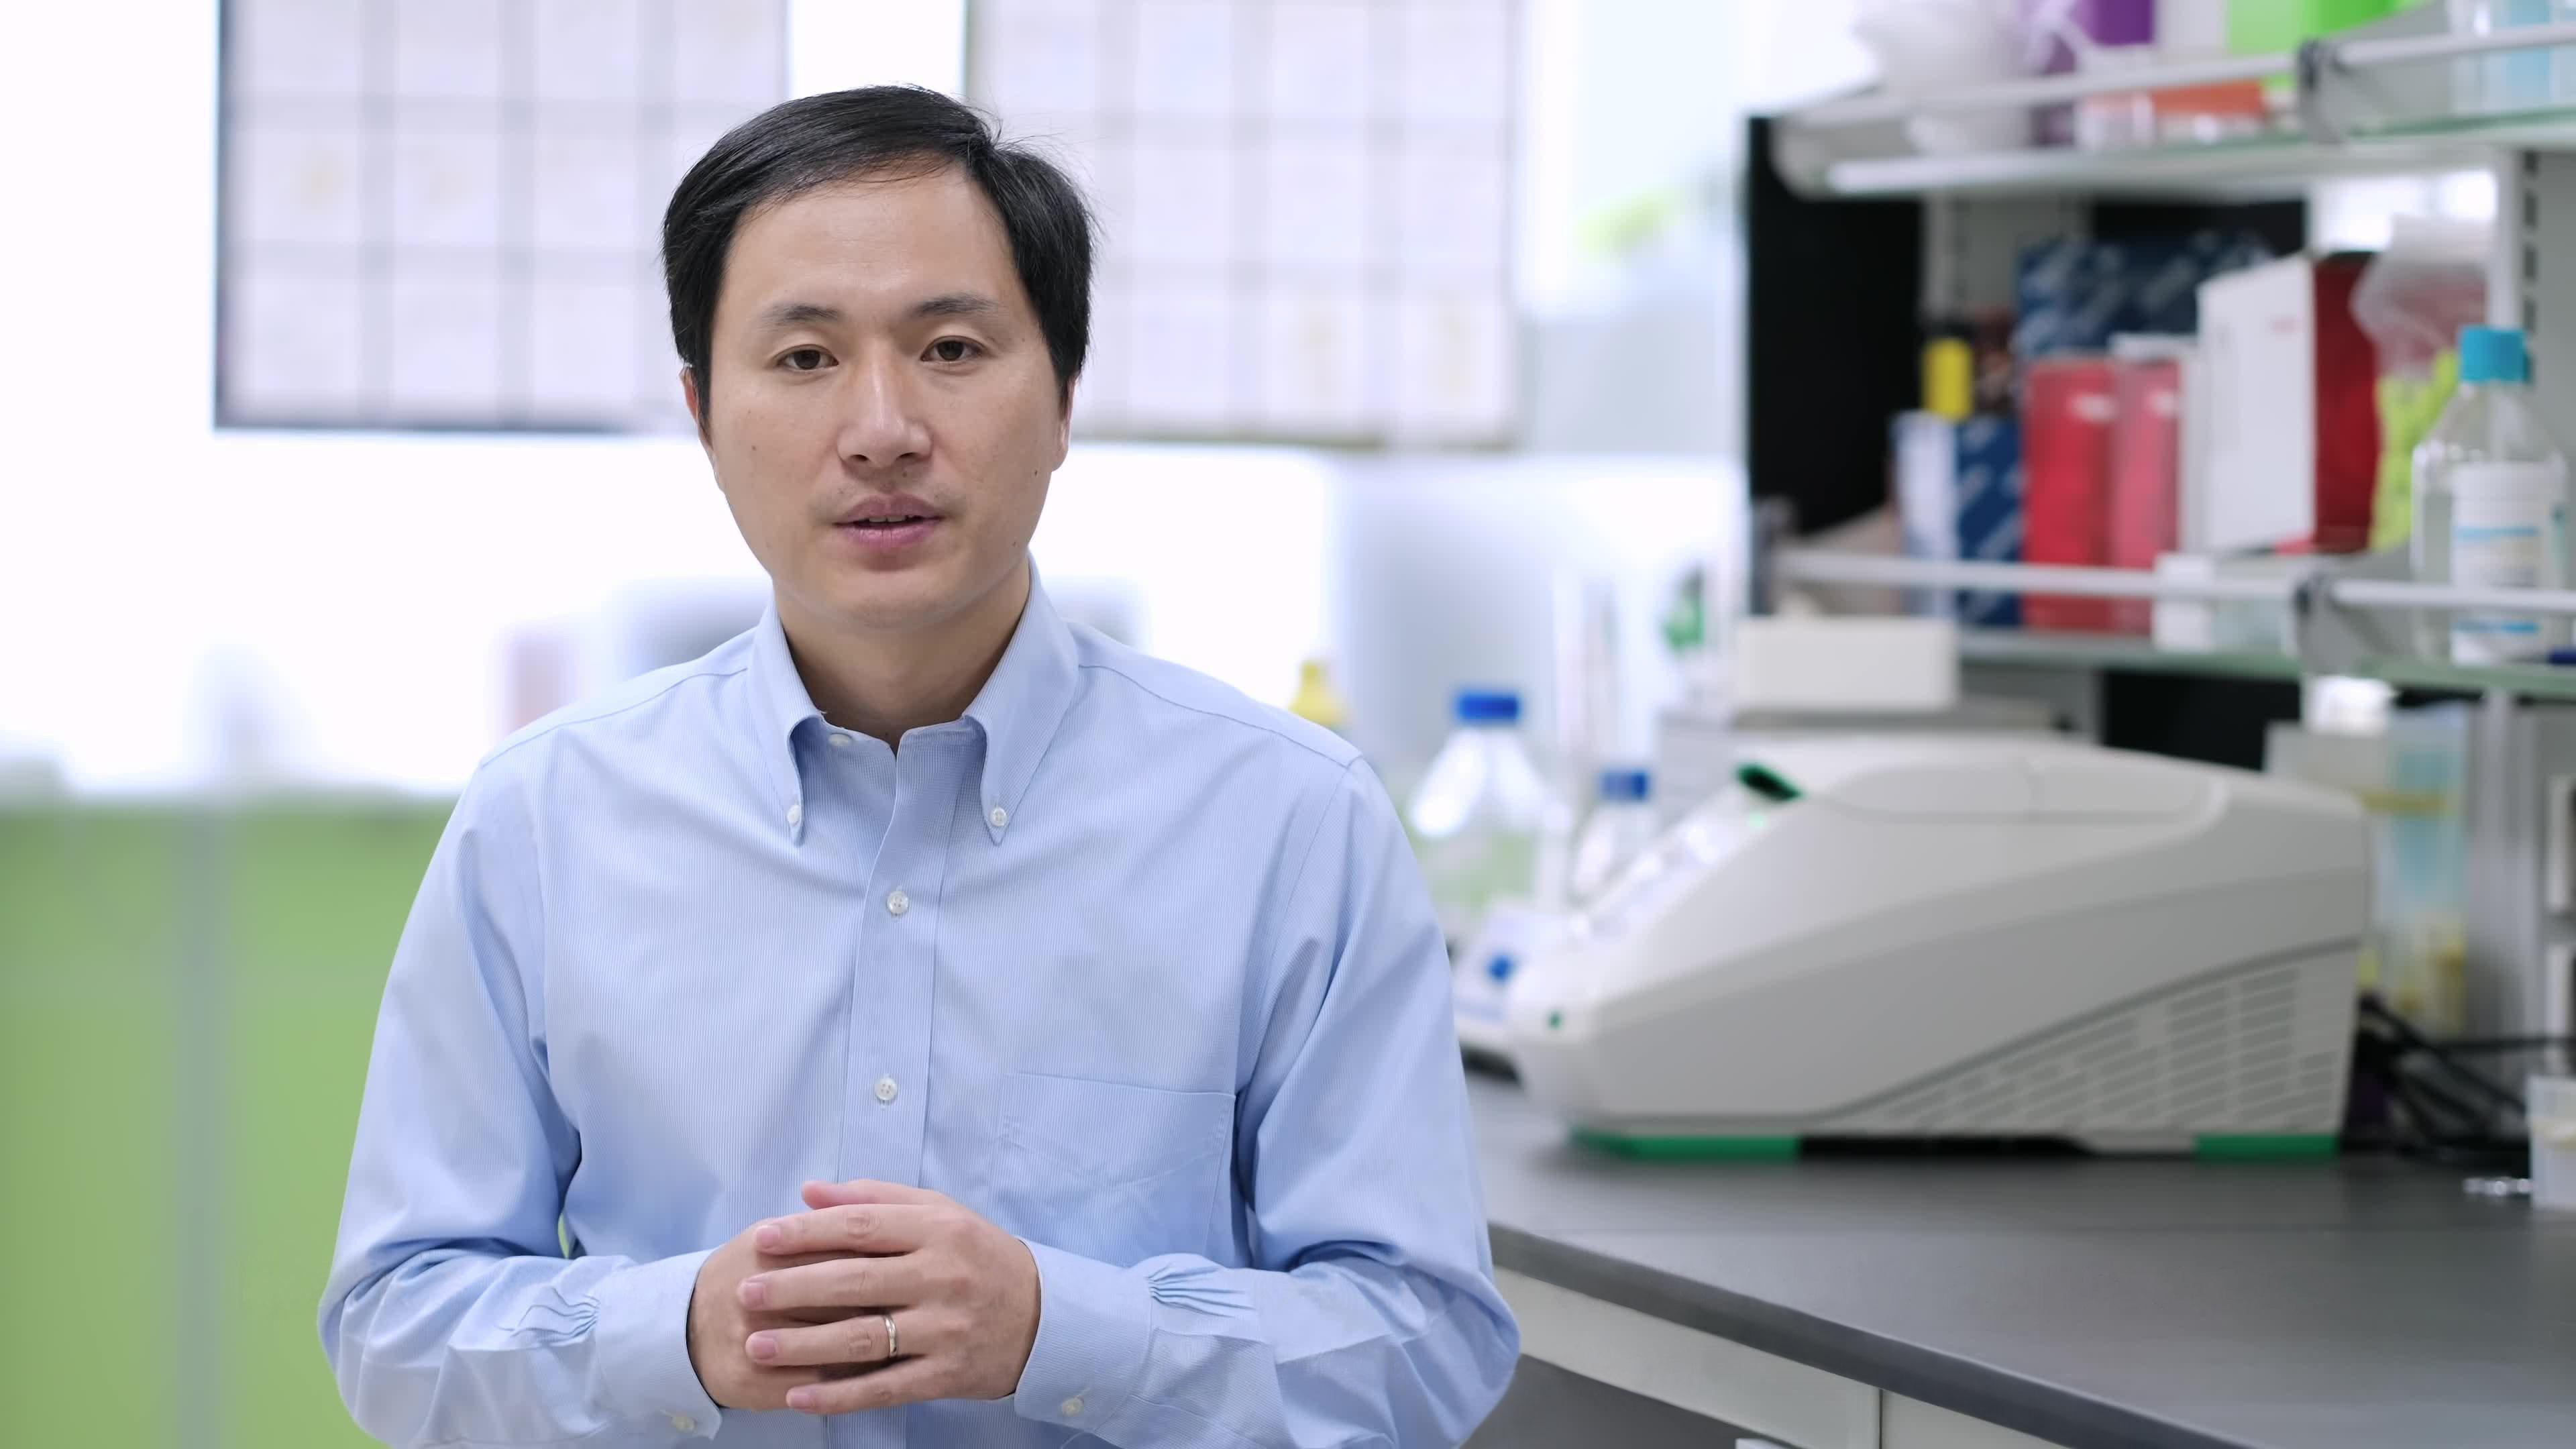 「遺伝子編集ベビー」問題、中国人科学者に懲役3年の実刑判決